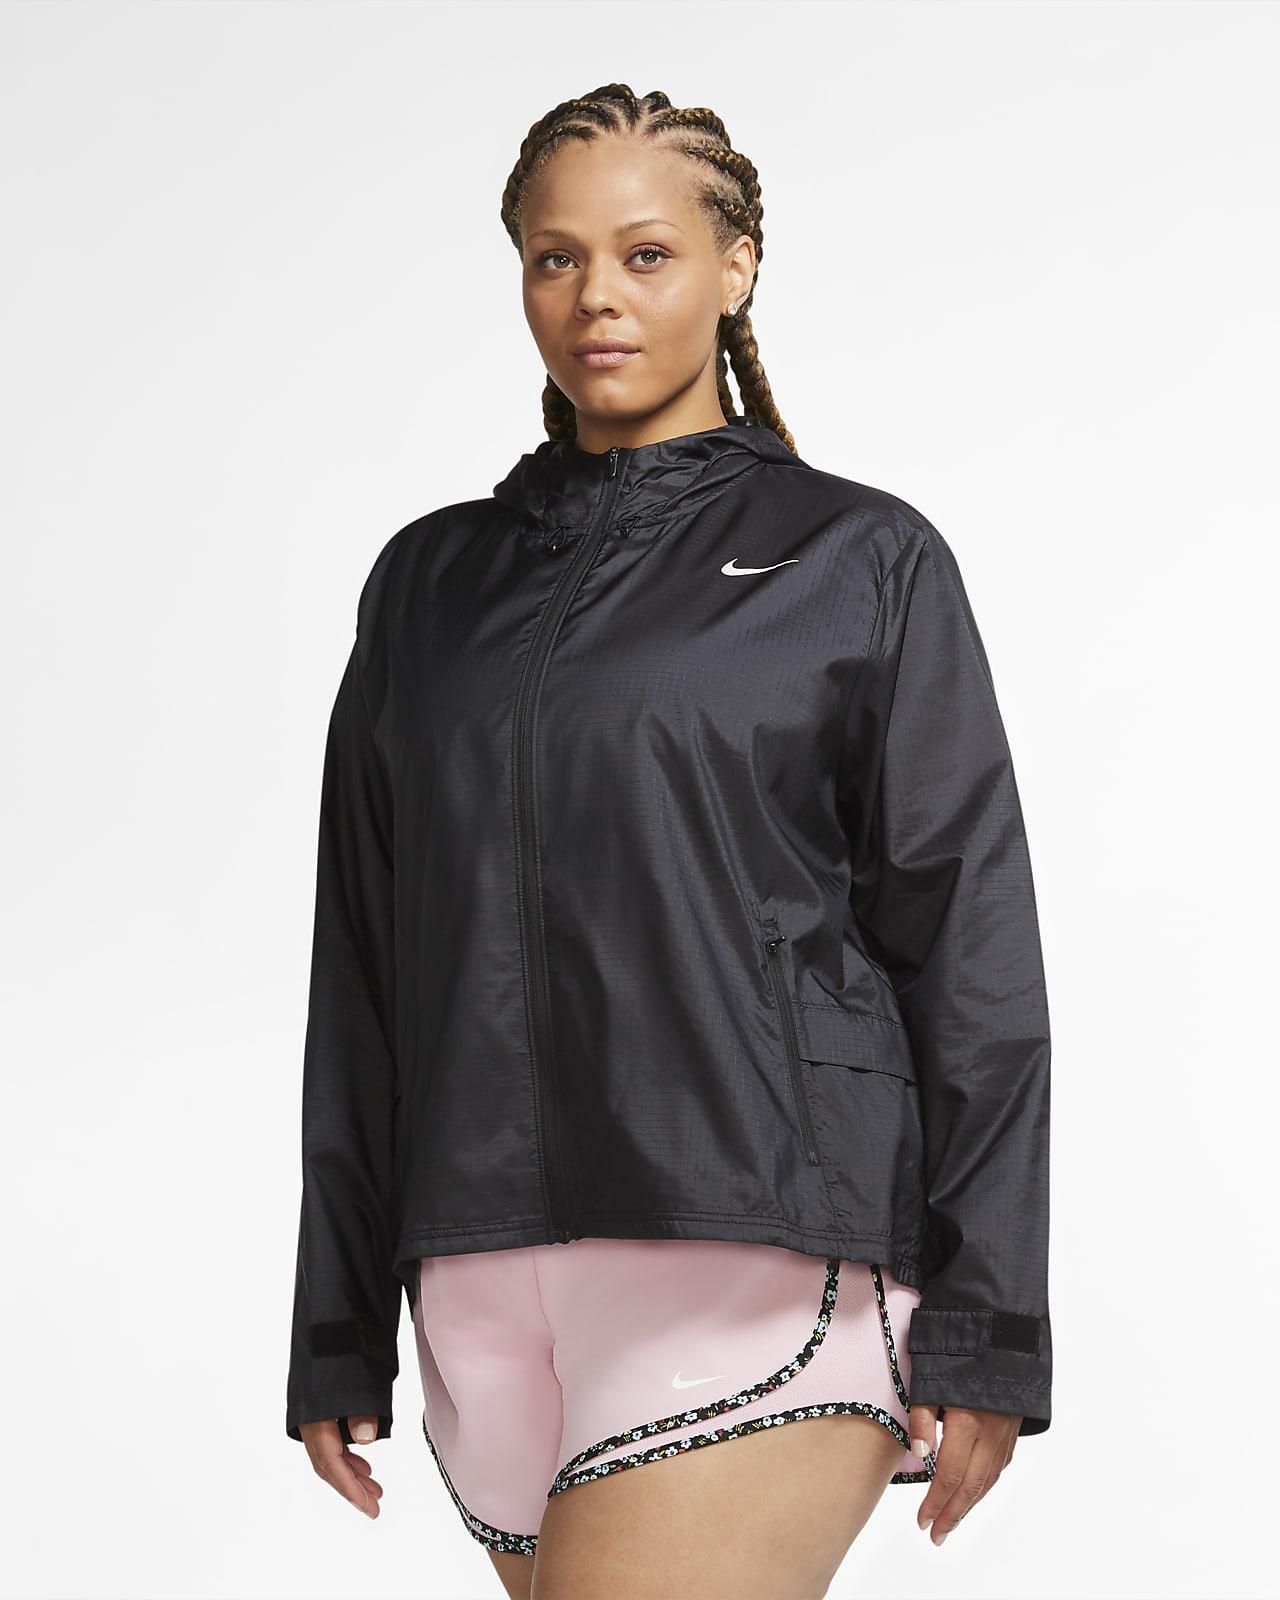 Veste de running Nike Essential pour Femme (grande taille)